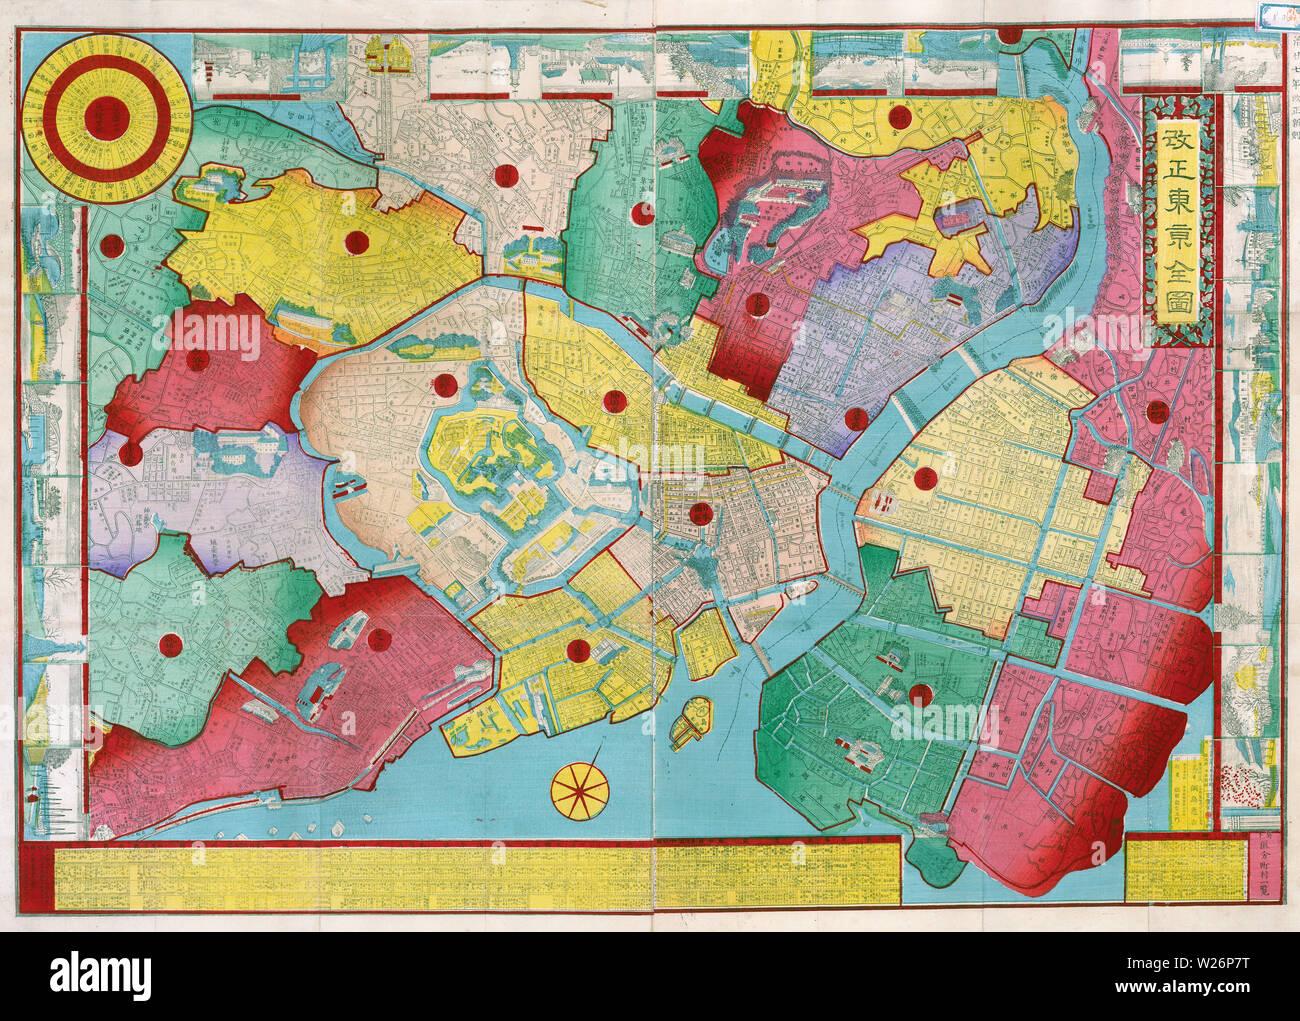 Japan Karte Physisch.Tokyo Karte Stockfotos Tokyo Karte Bilder Alamy